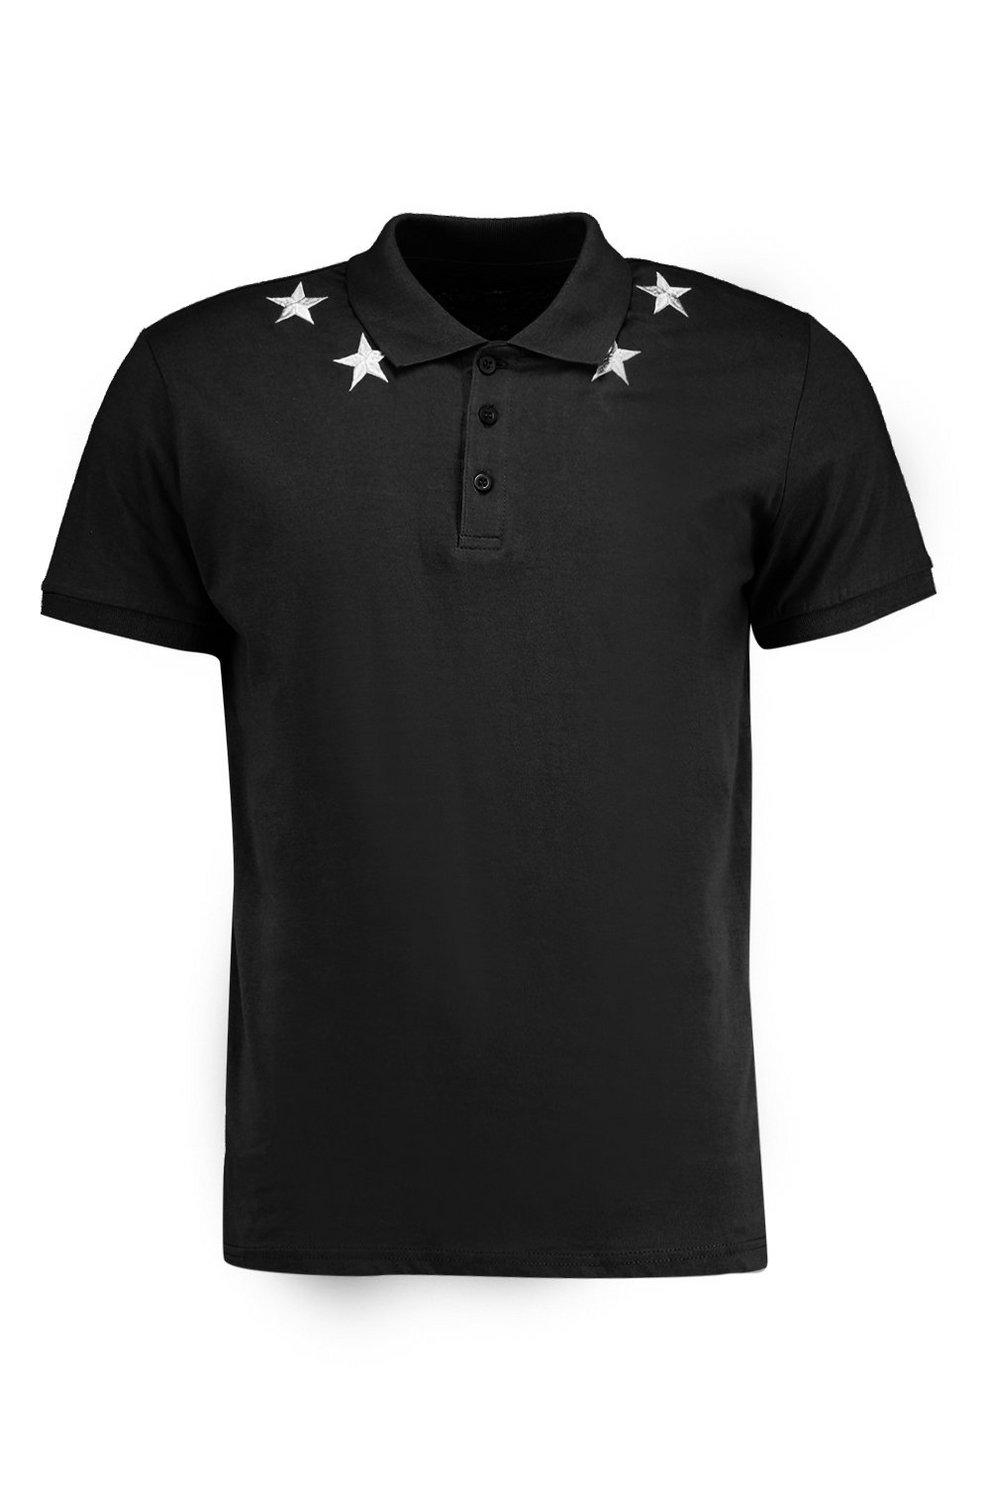 black-star-embroided-polo.jpg